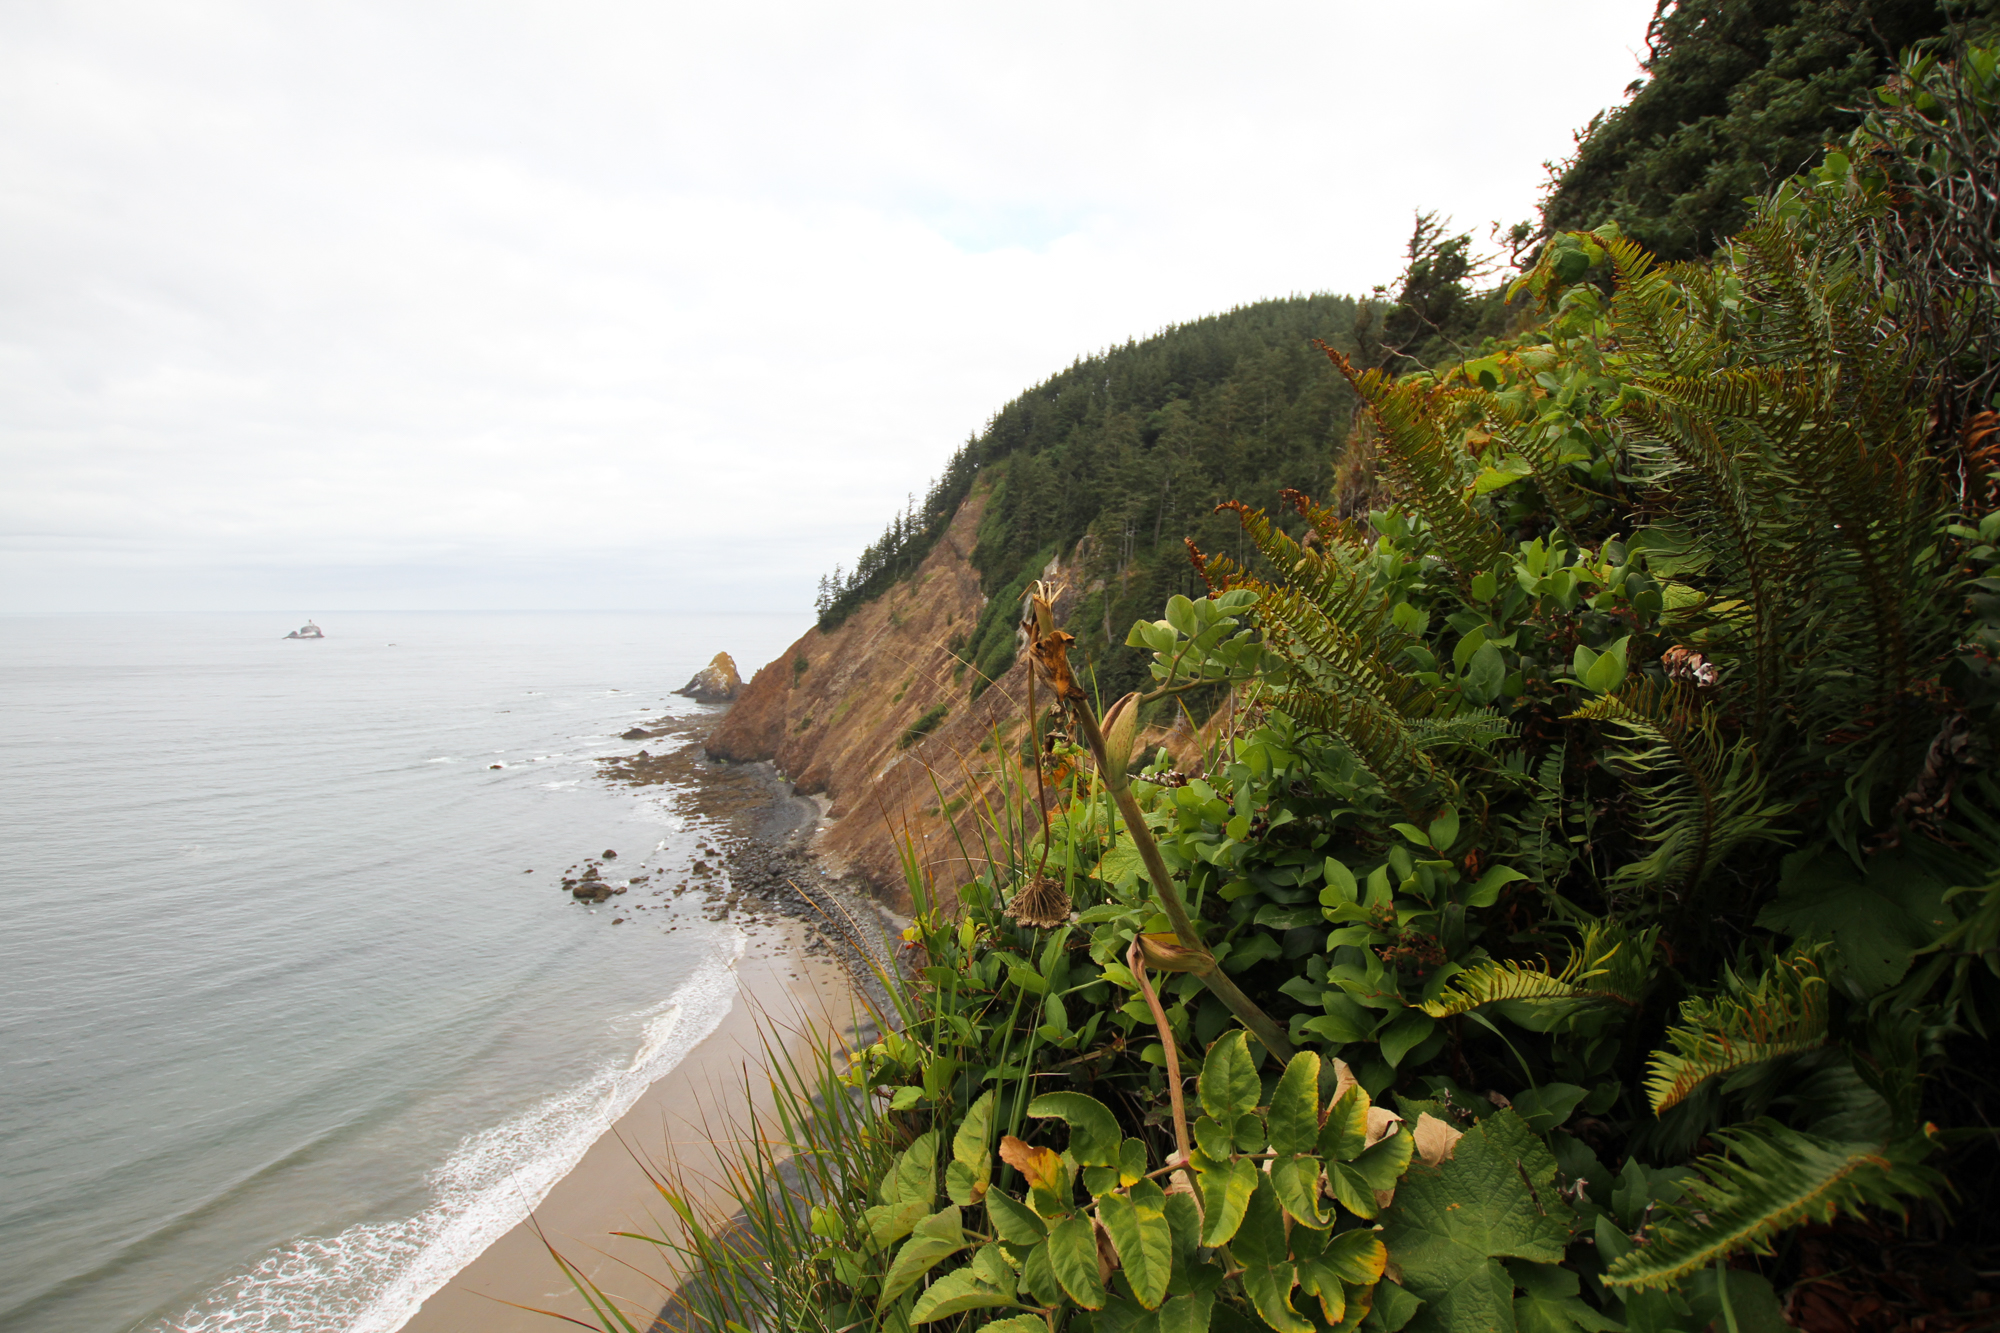 Oregon_2015-0137.jpg